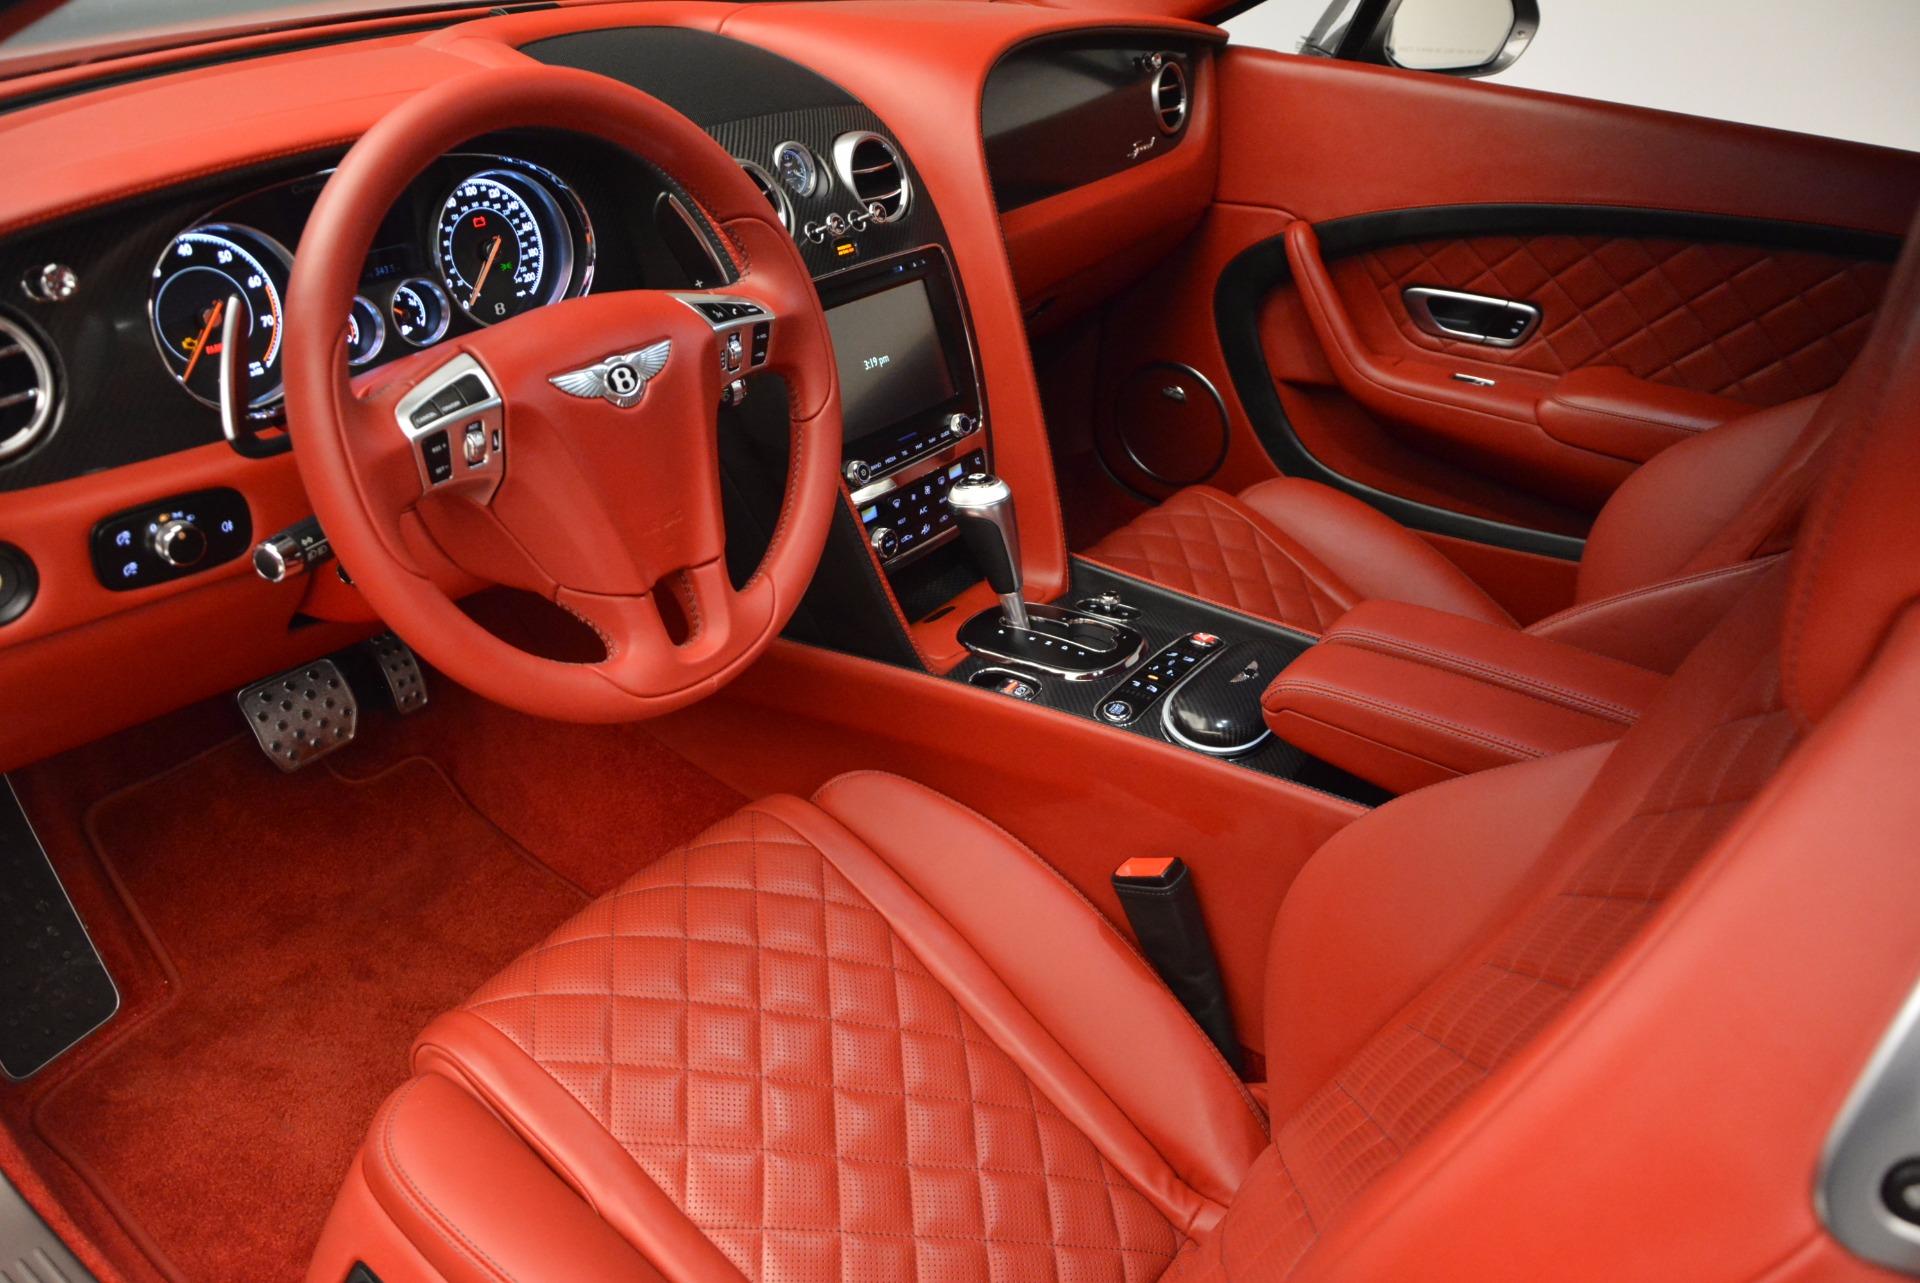 Used 2016 Bentley Continental GT Speed For Sale In Westport, CT 910_p28